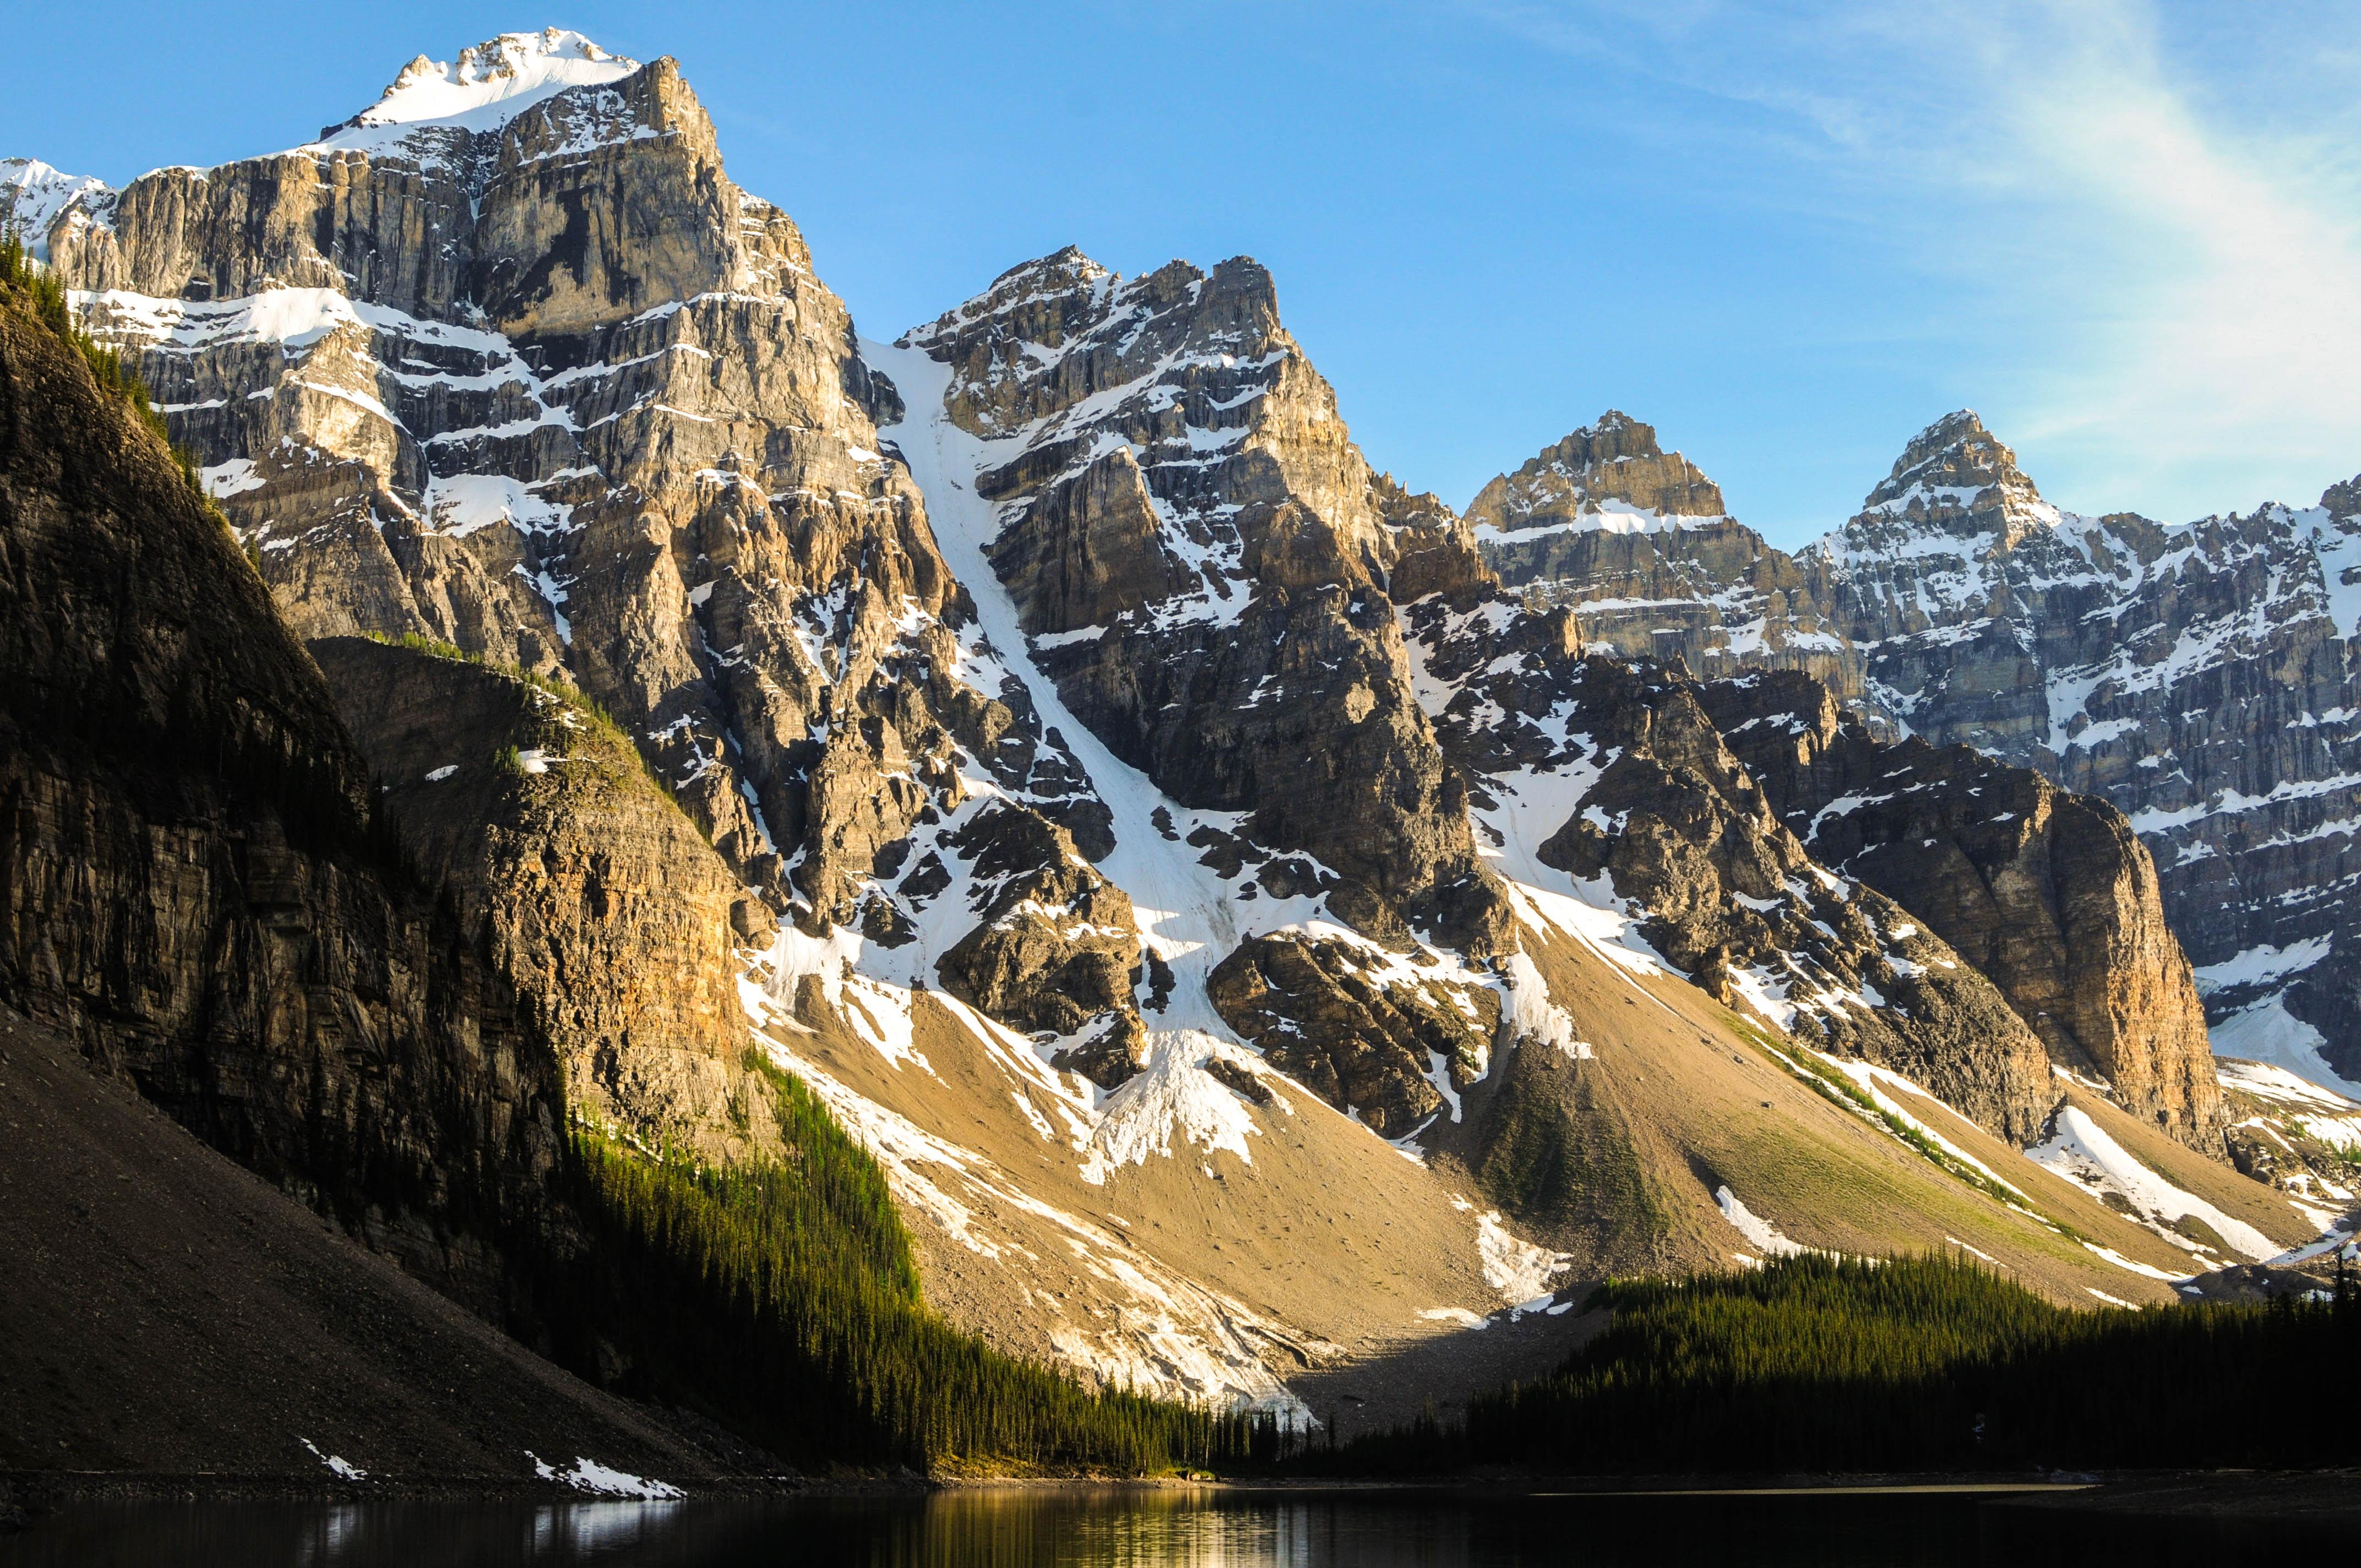 Snow covered mountain peaks next to Moraine Lake.